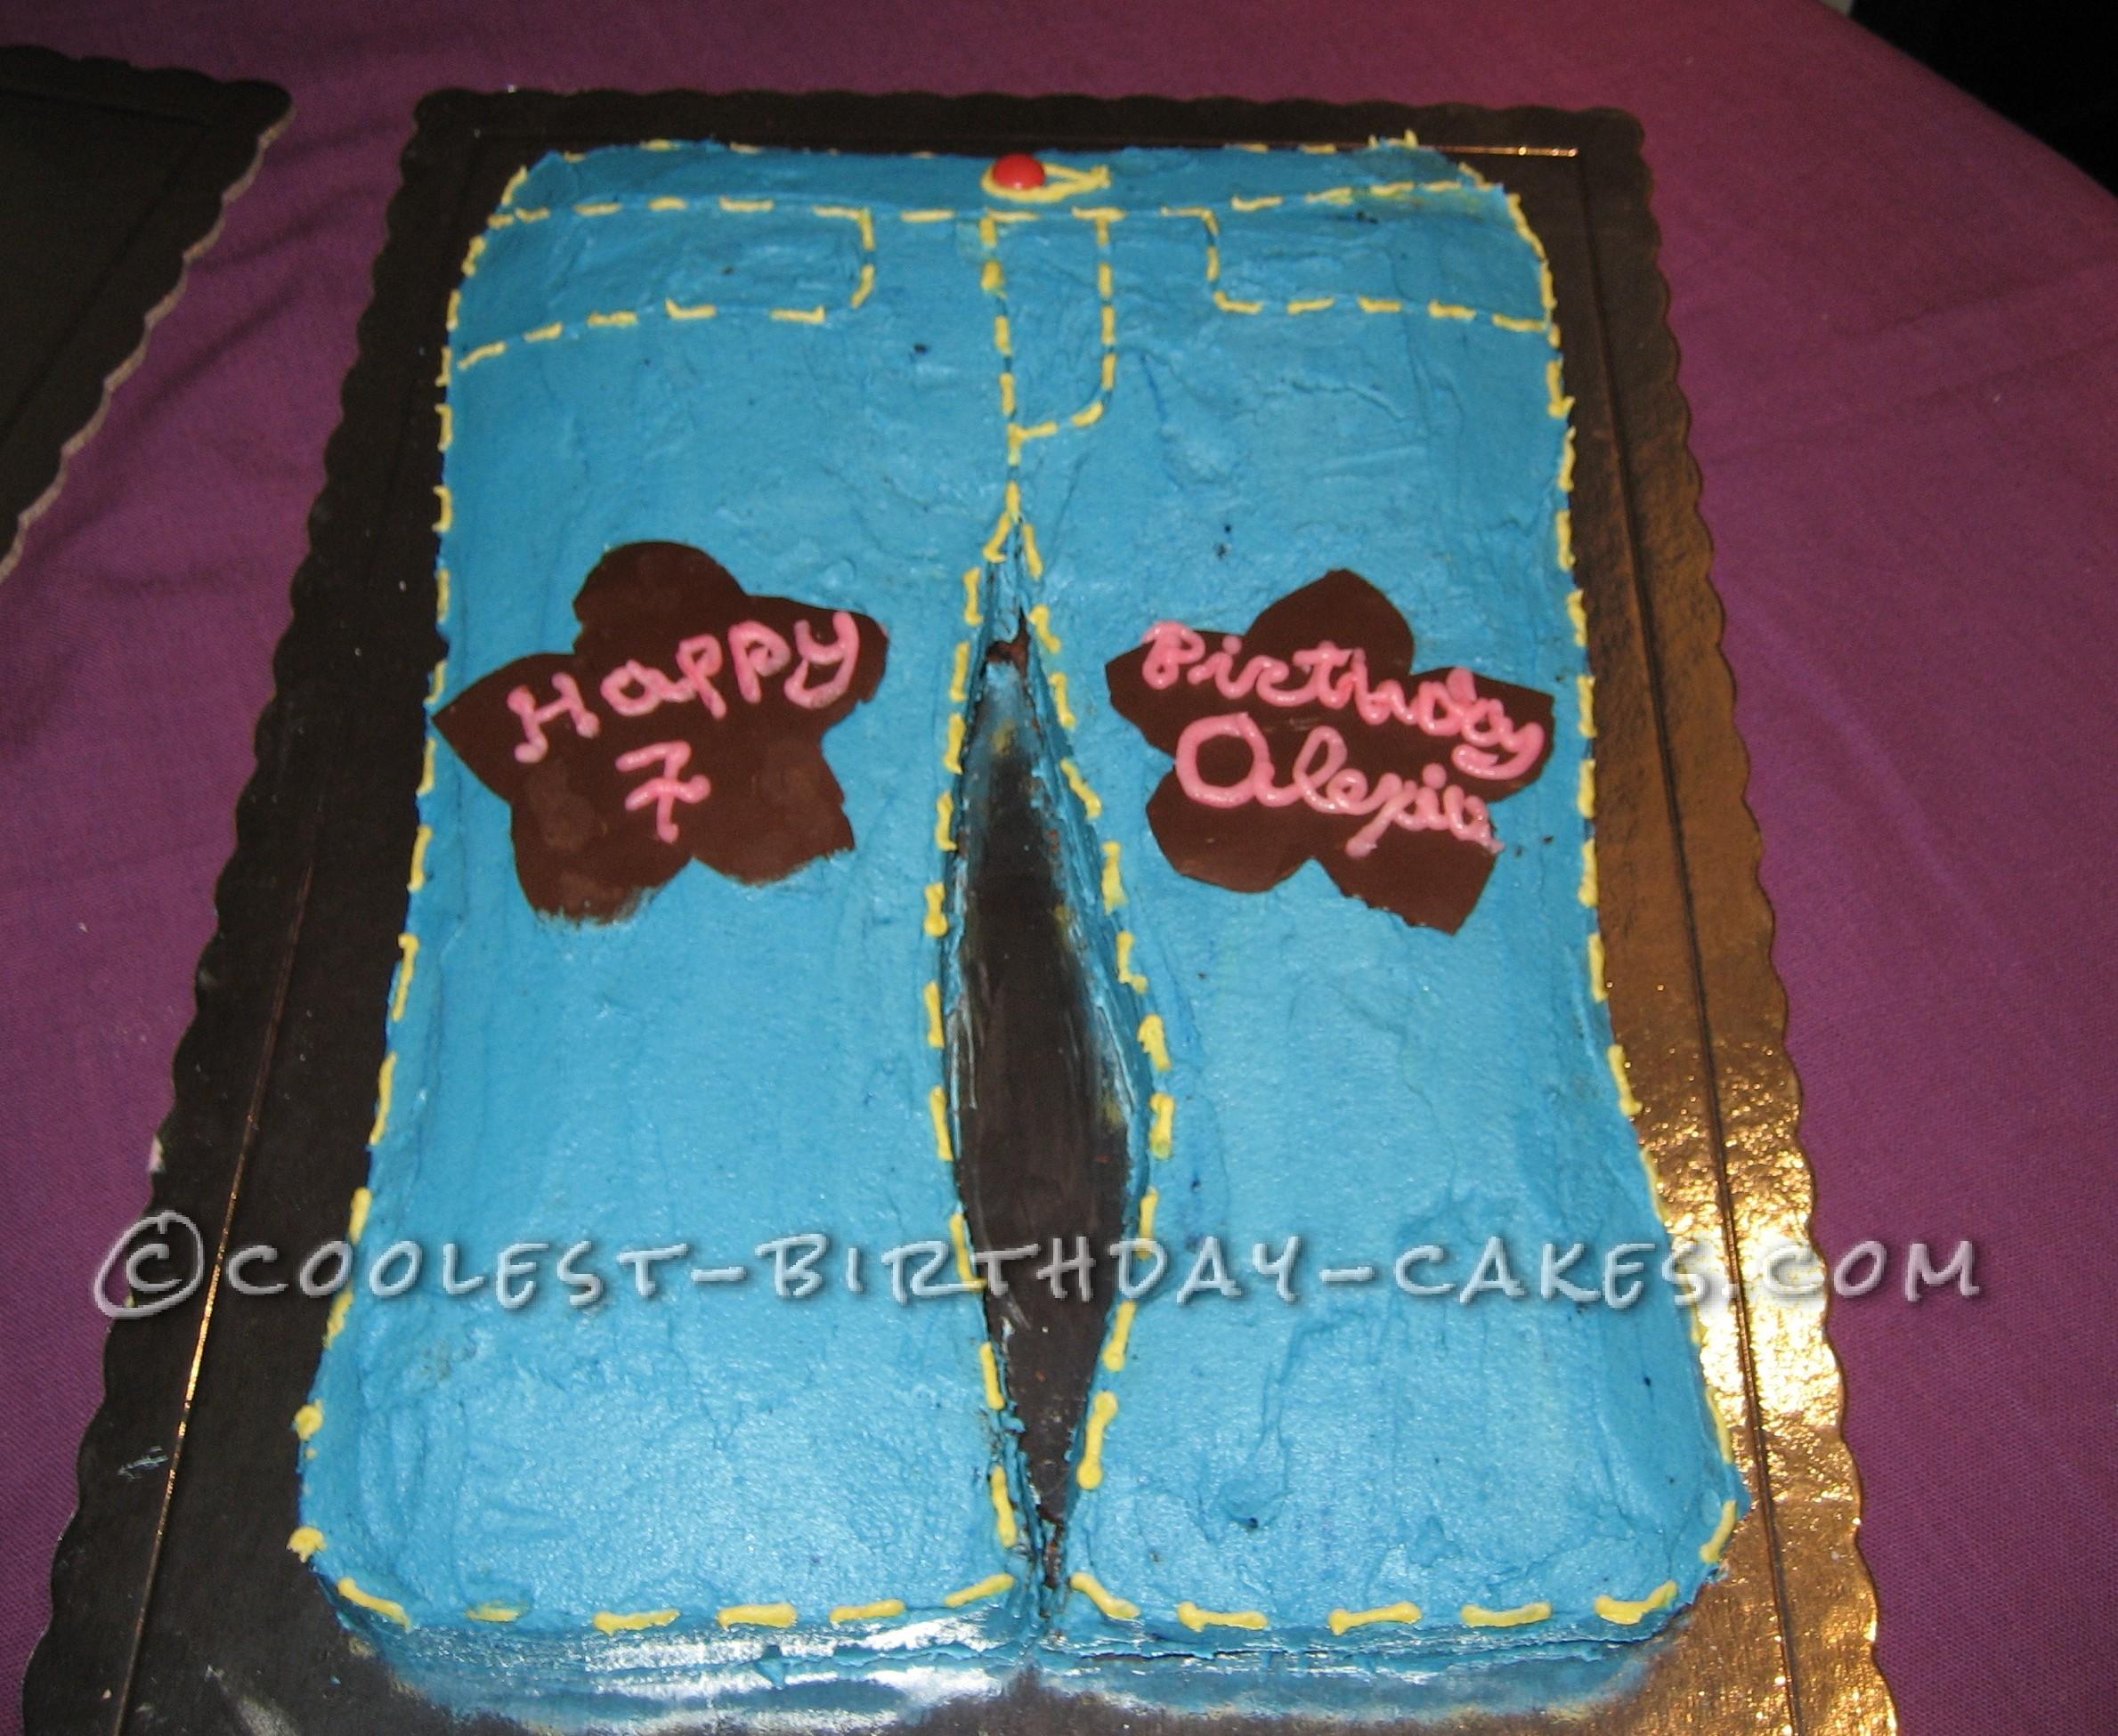 Coolest Blue Jeans Cake